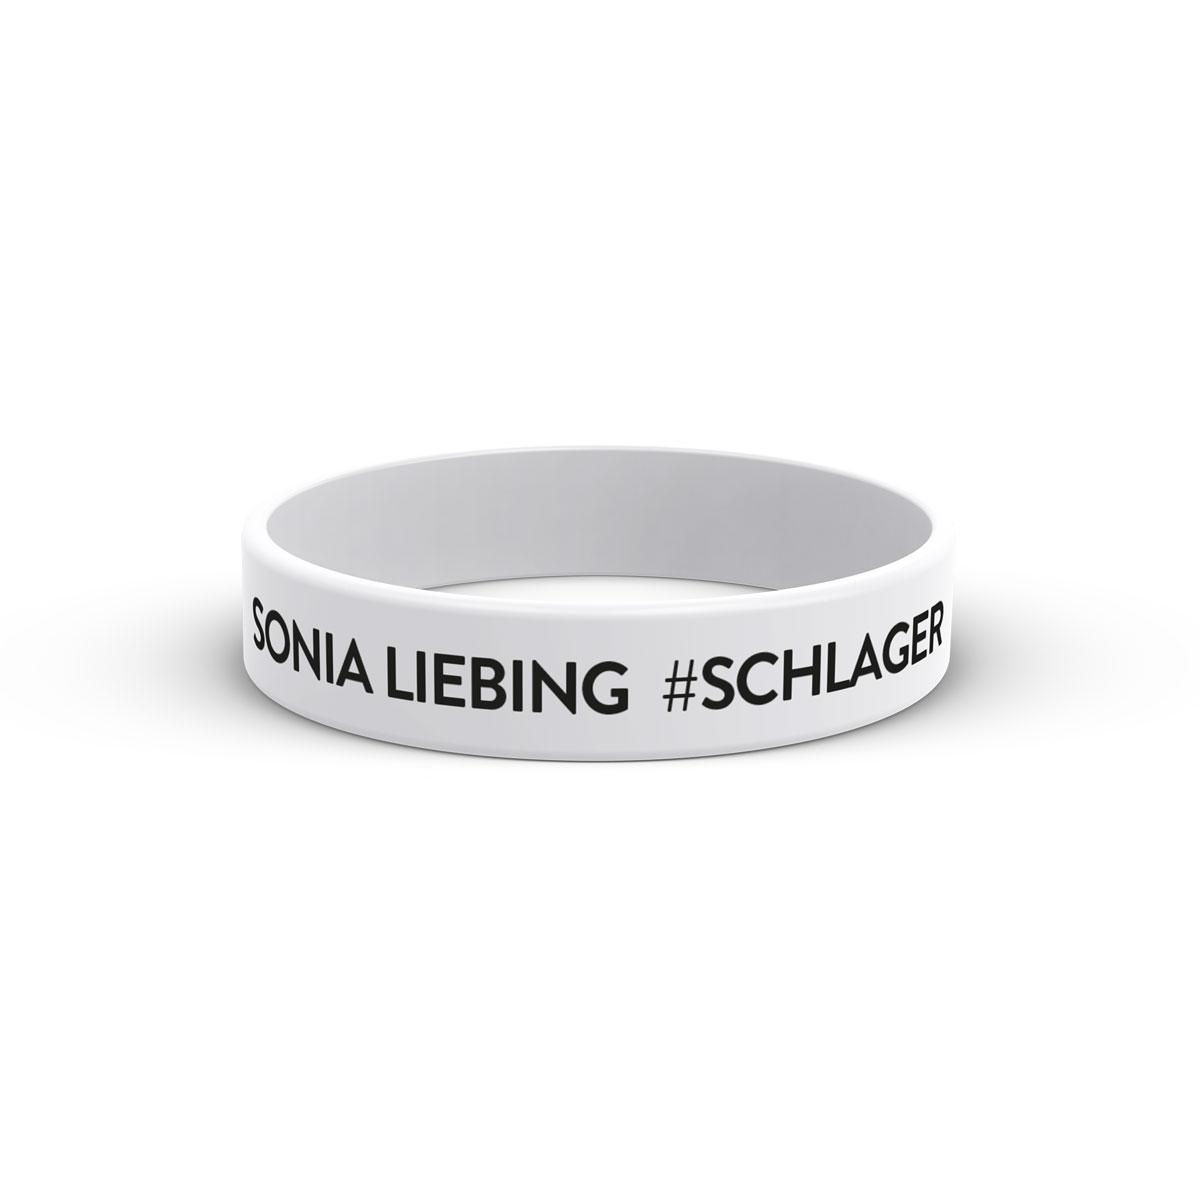 Sonia Liebing Armband-Set 3teilig